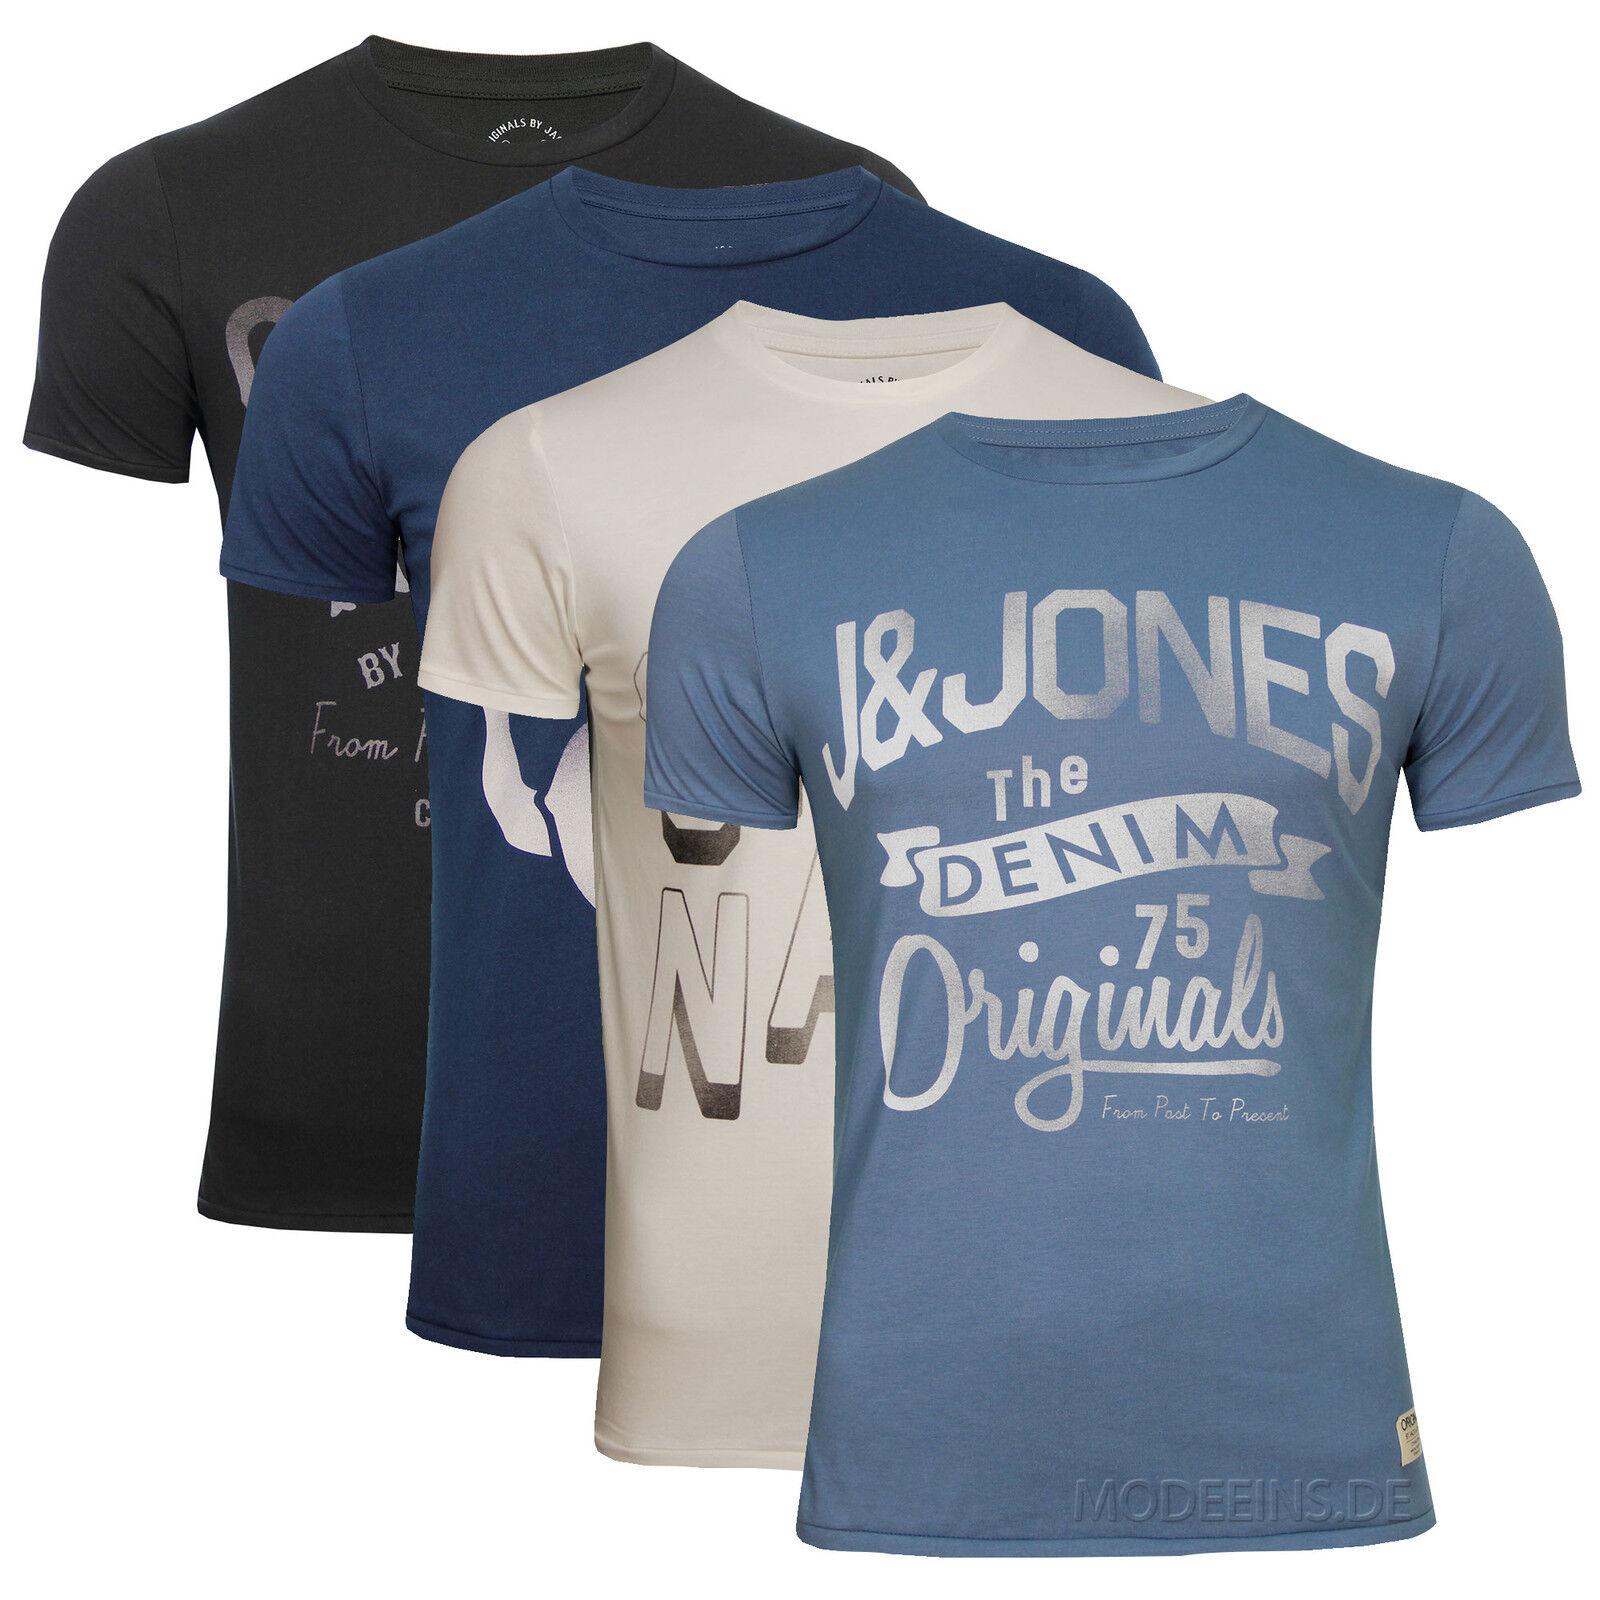 Jack & Jones Herren Polo Shirt Polohemd Kurzarmshirt Poloshirt Freizeithemd Wow Clothing, Shoes & Accessories Men's Clothing